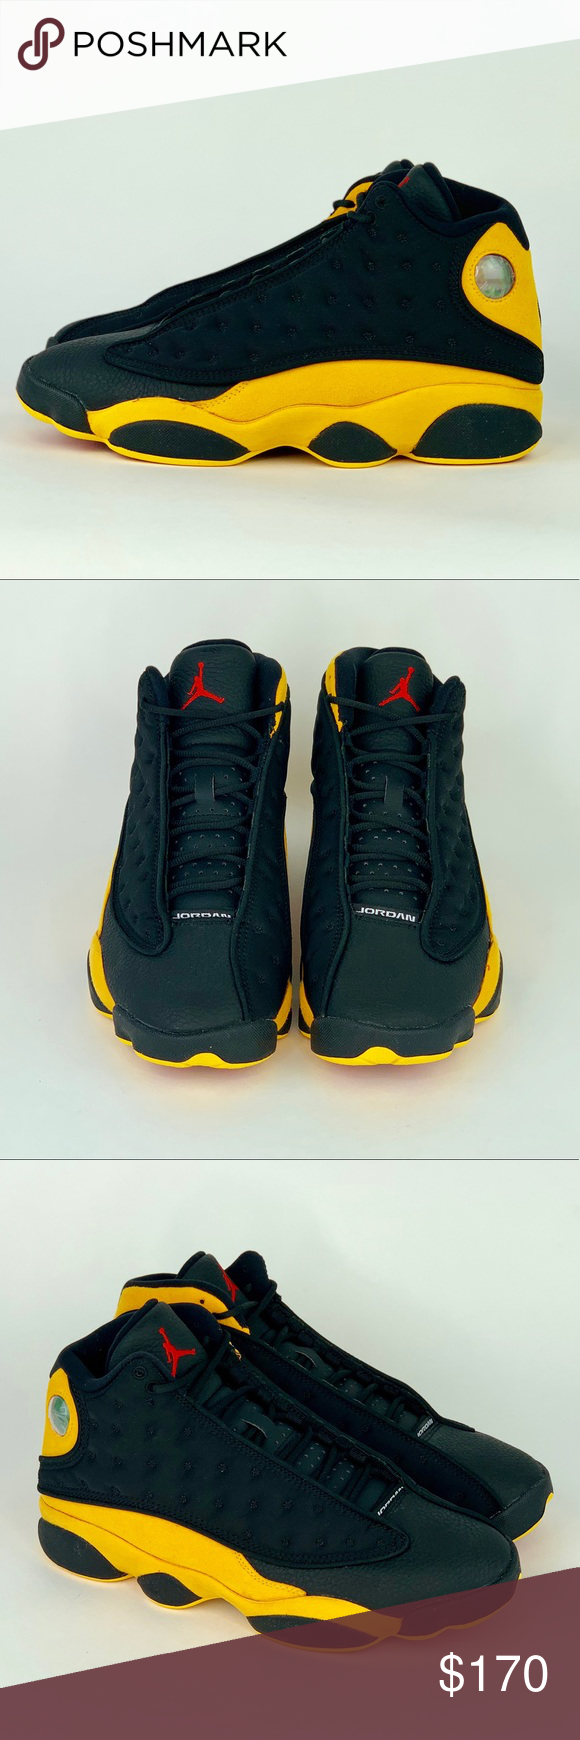 buy popular 377ca dab1e Nike Air Jordan 13 Retro 'Melo Class of 2002' Sz 9 Brand New ...